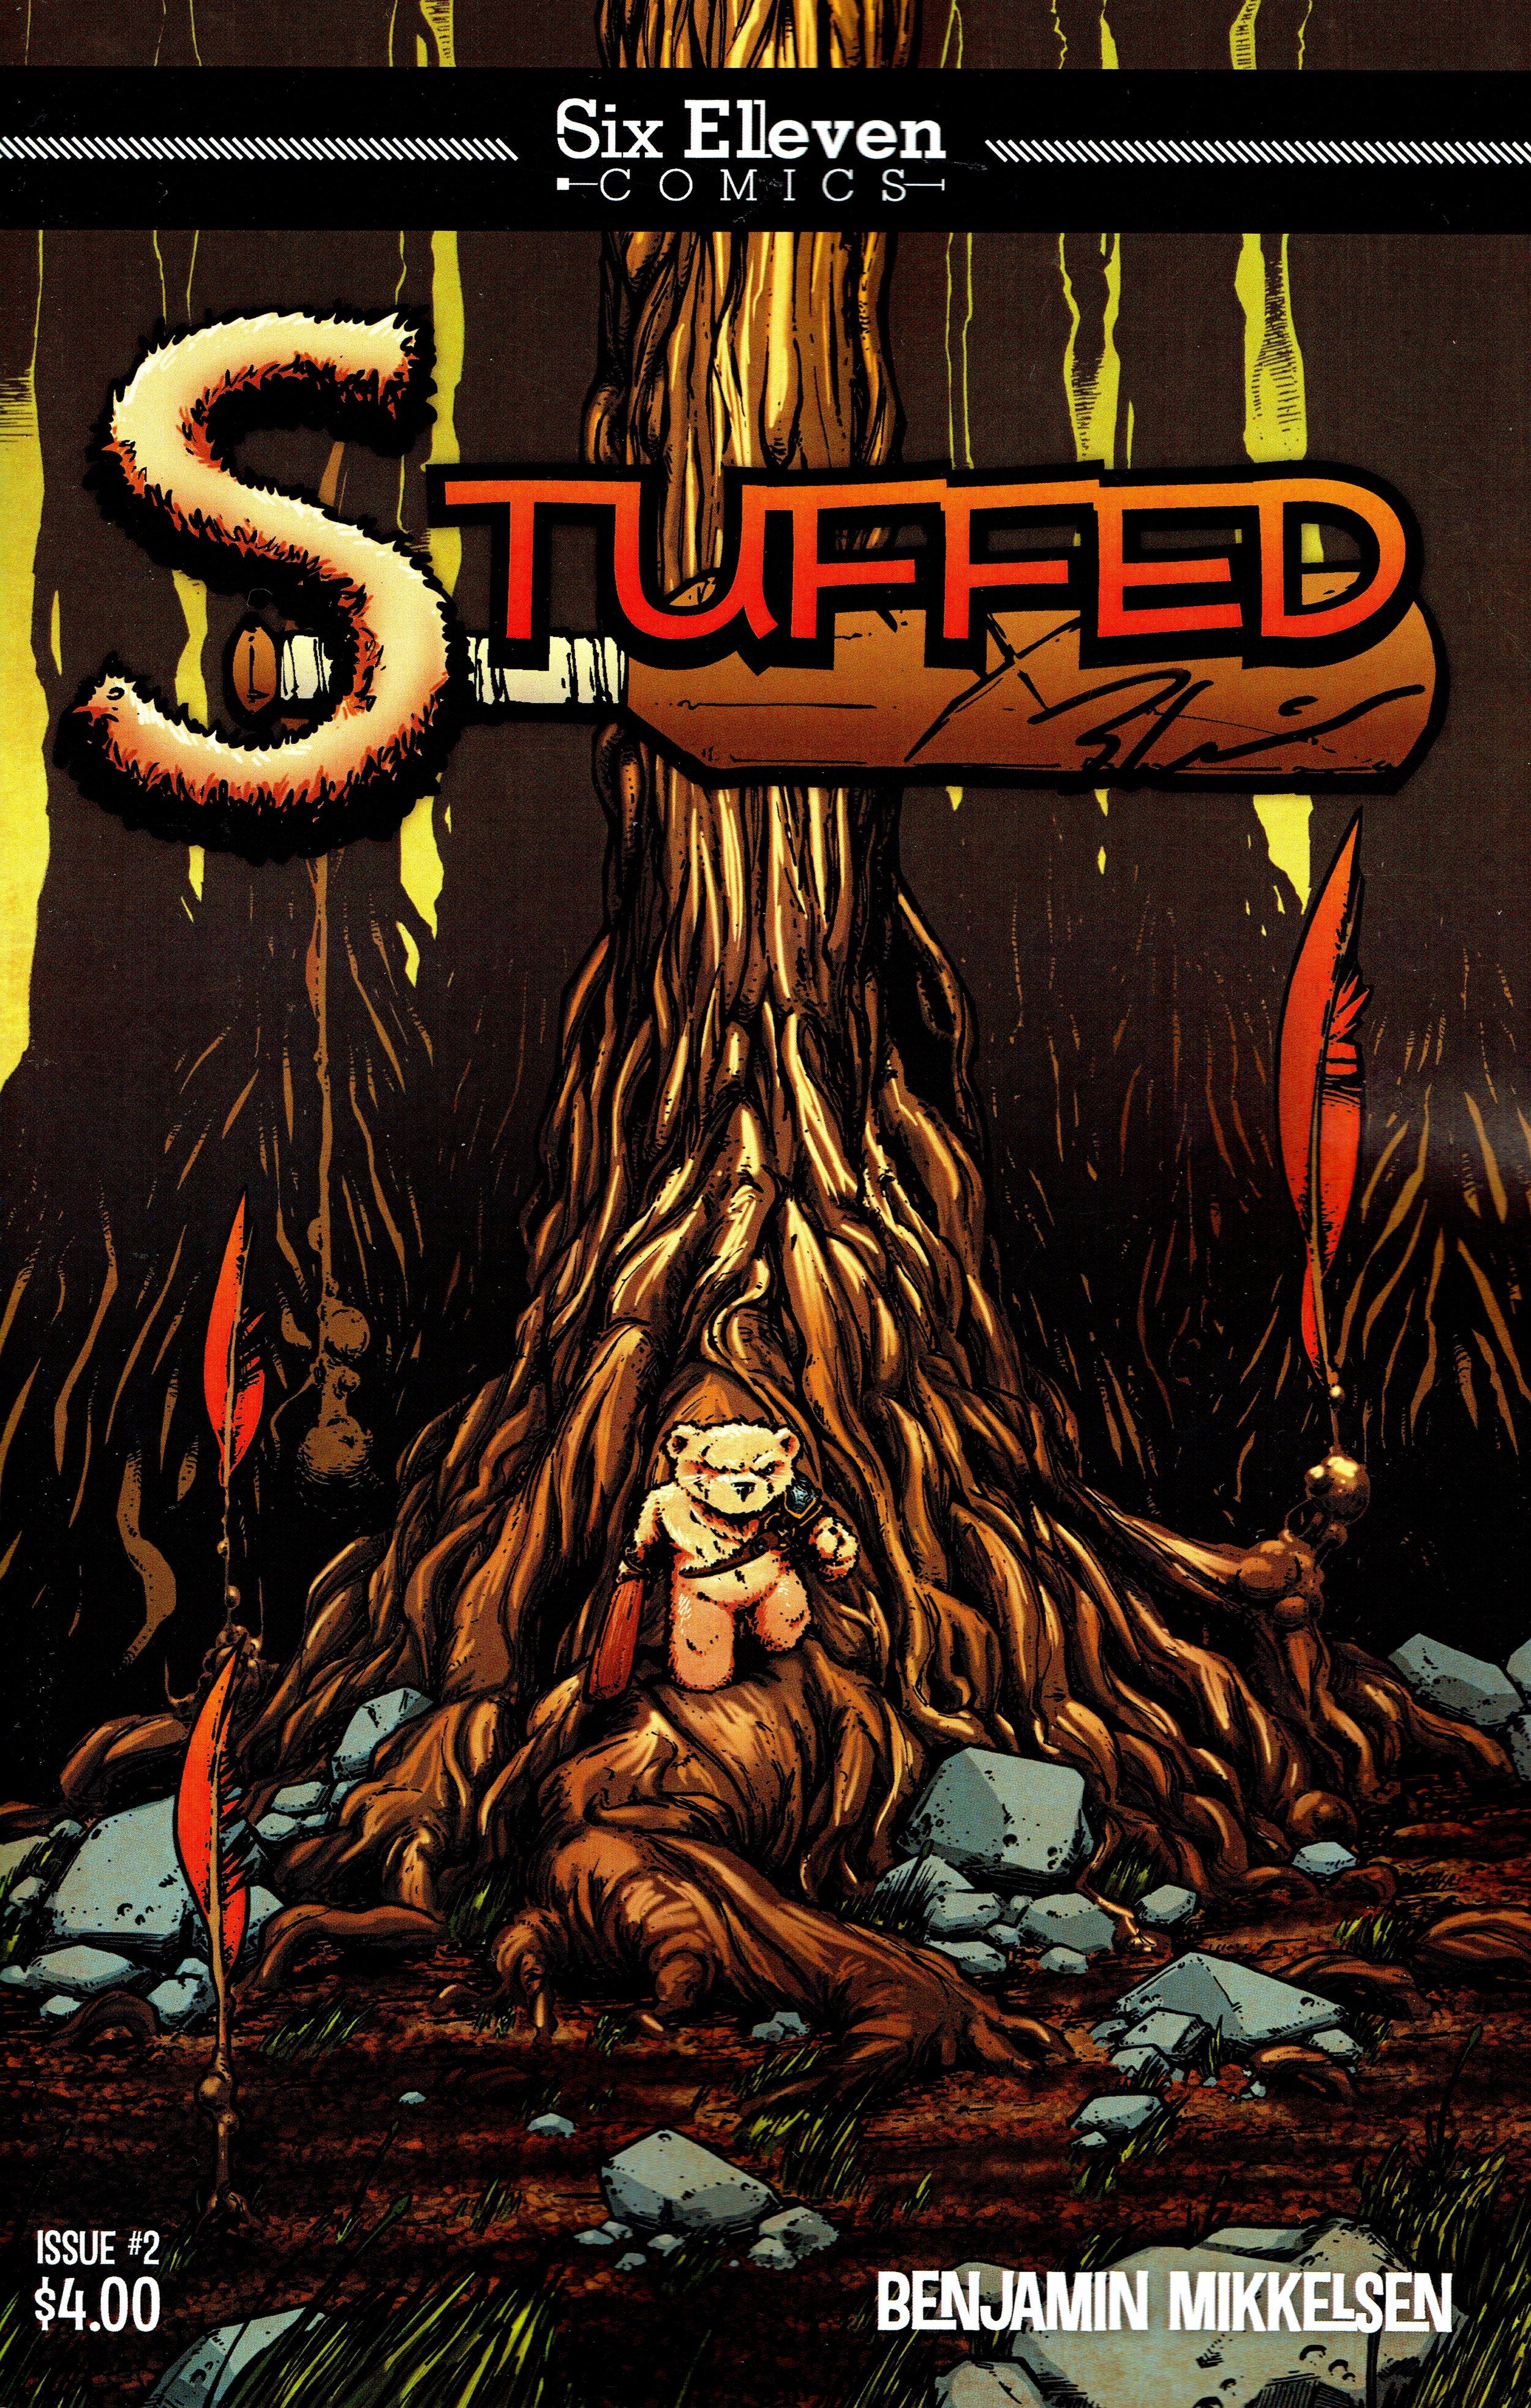 Stuffed #2 by Ben Mikkelsen.